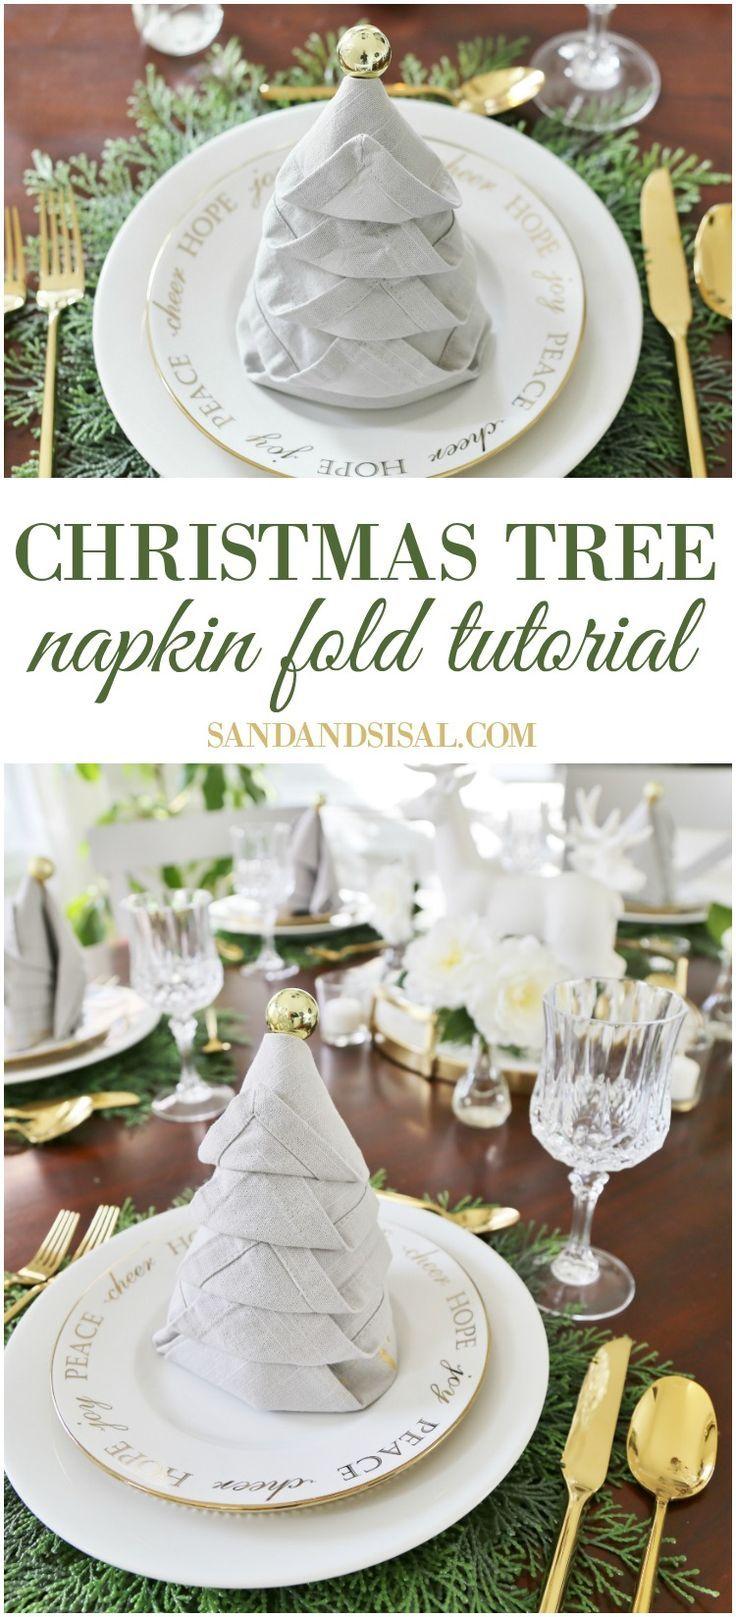 Eurodif Catalogue 2016 Impressionnant Image Christmas Tree Napkin Fold Tutorial